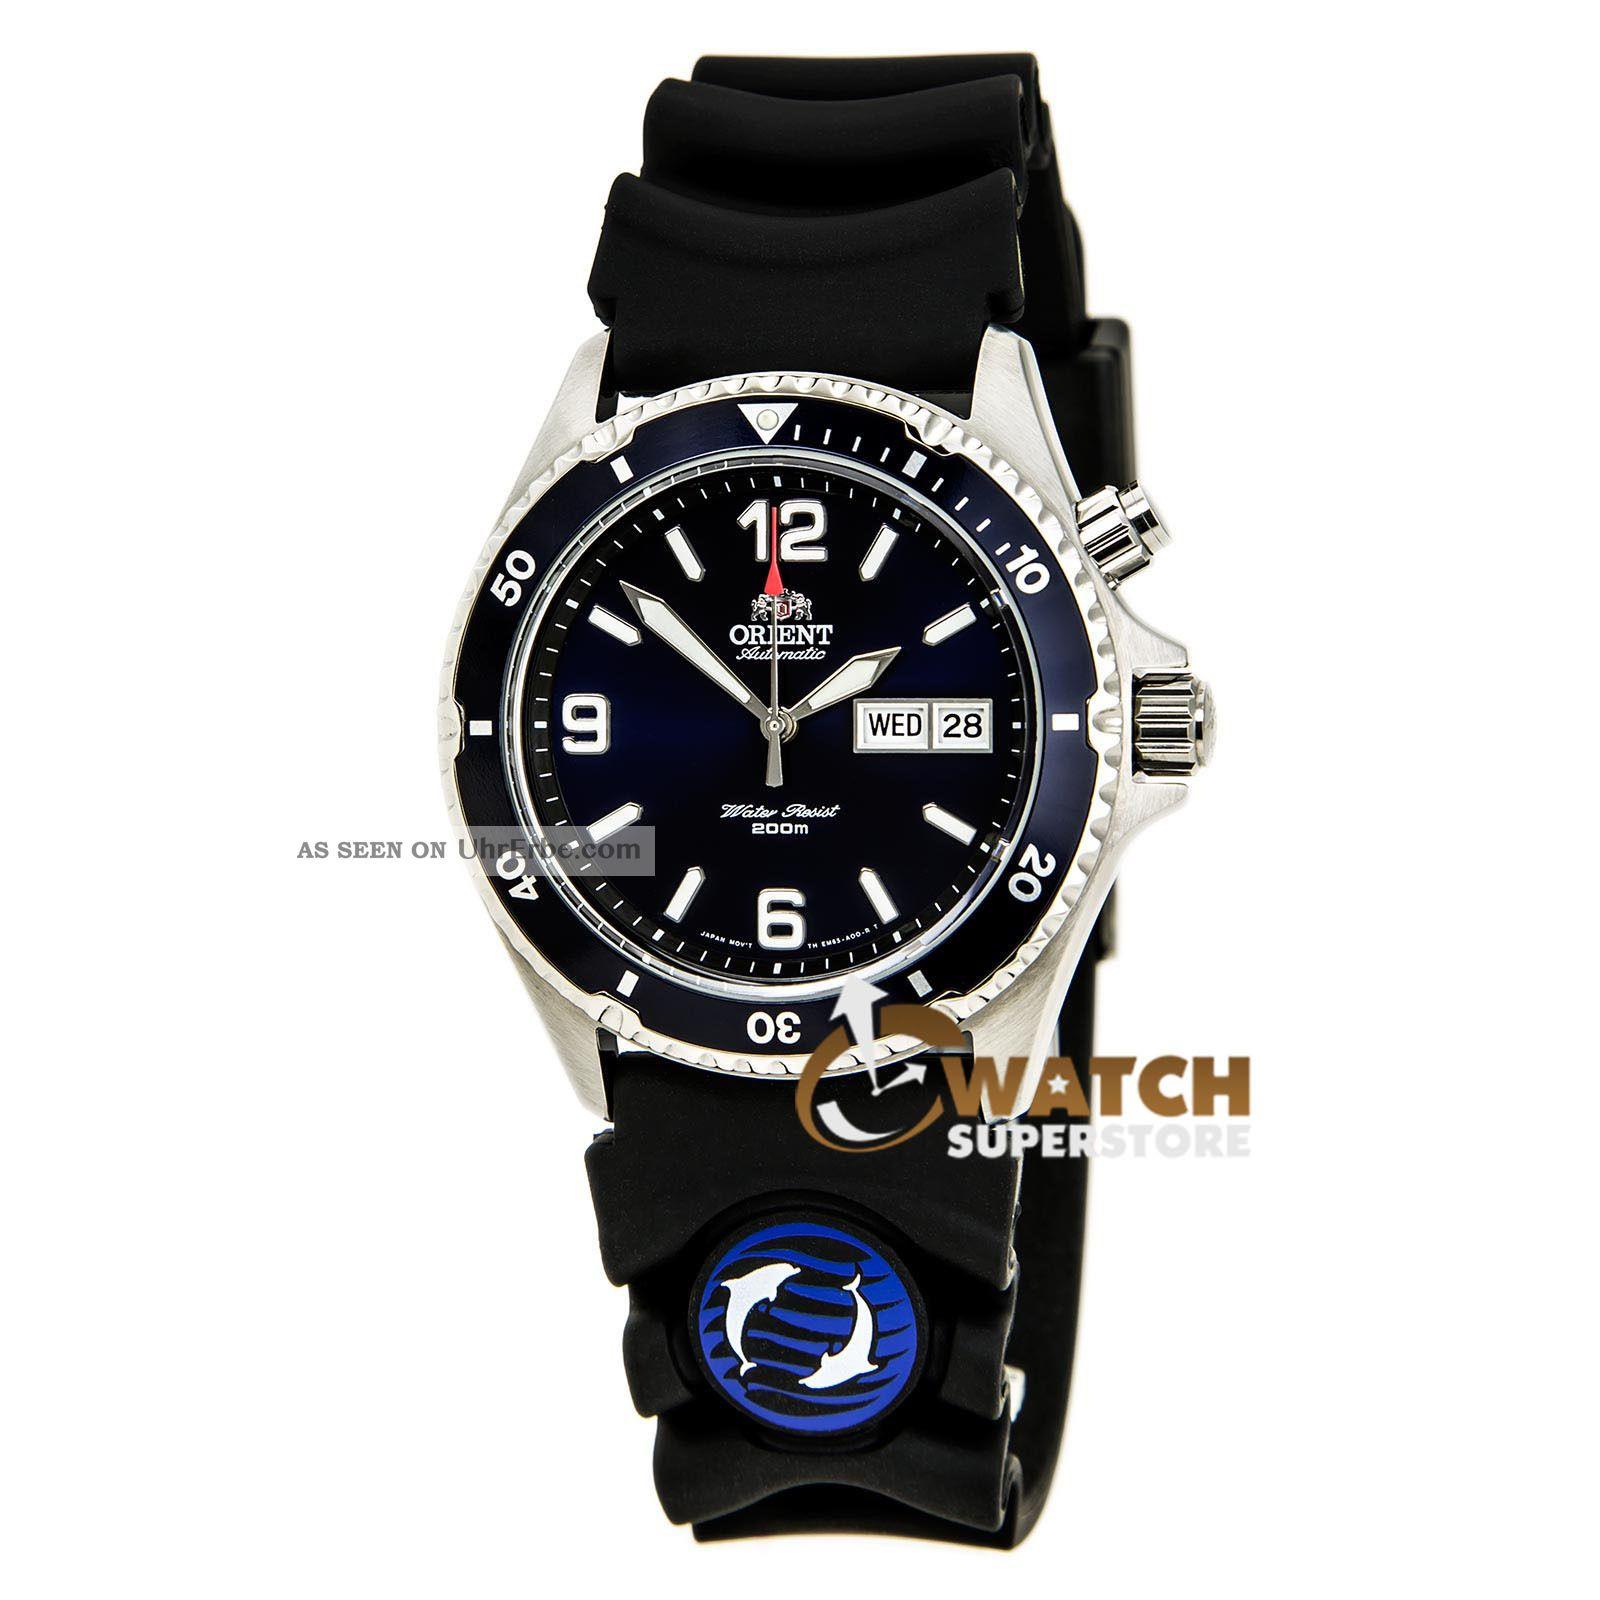 Taucheruhr Herren Orient Cem65005d Blau Mako Gummiband & Zifferblatt Automatisch Armbanduhren Bild